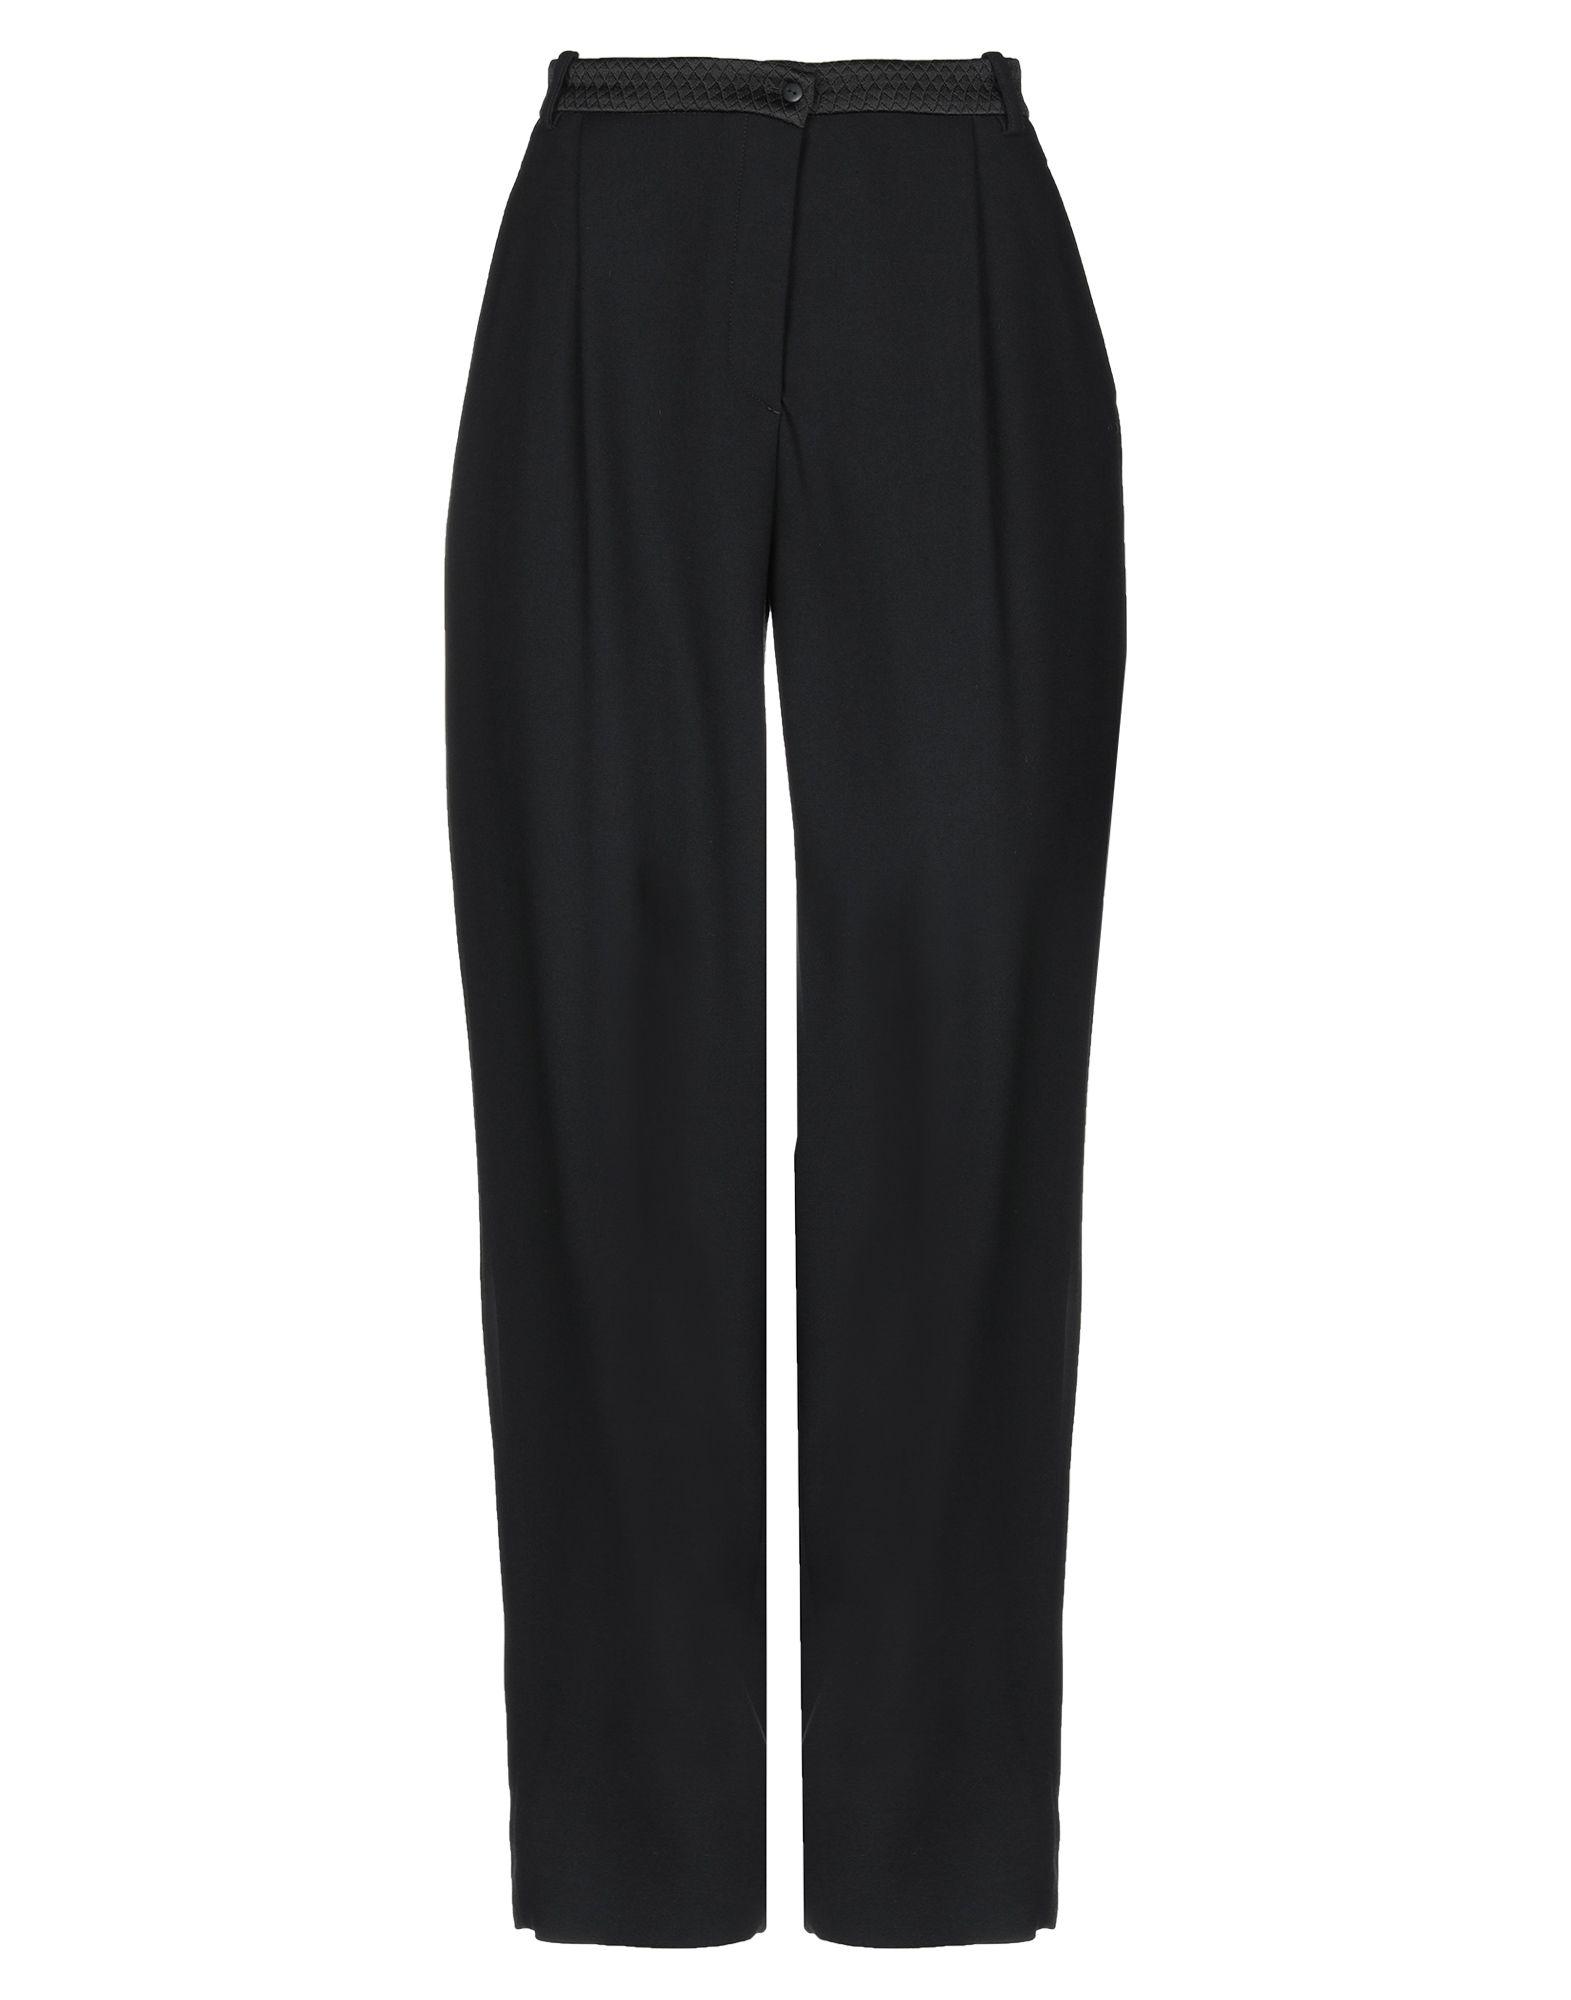 TWISTY PARALLEL UNIVERSE Повседневные брюки twisty parallel universe джинсовая верхняя одежда